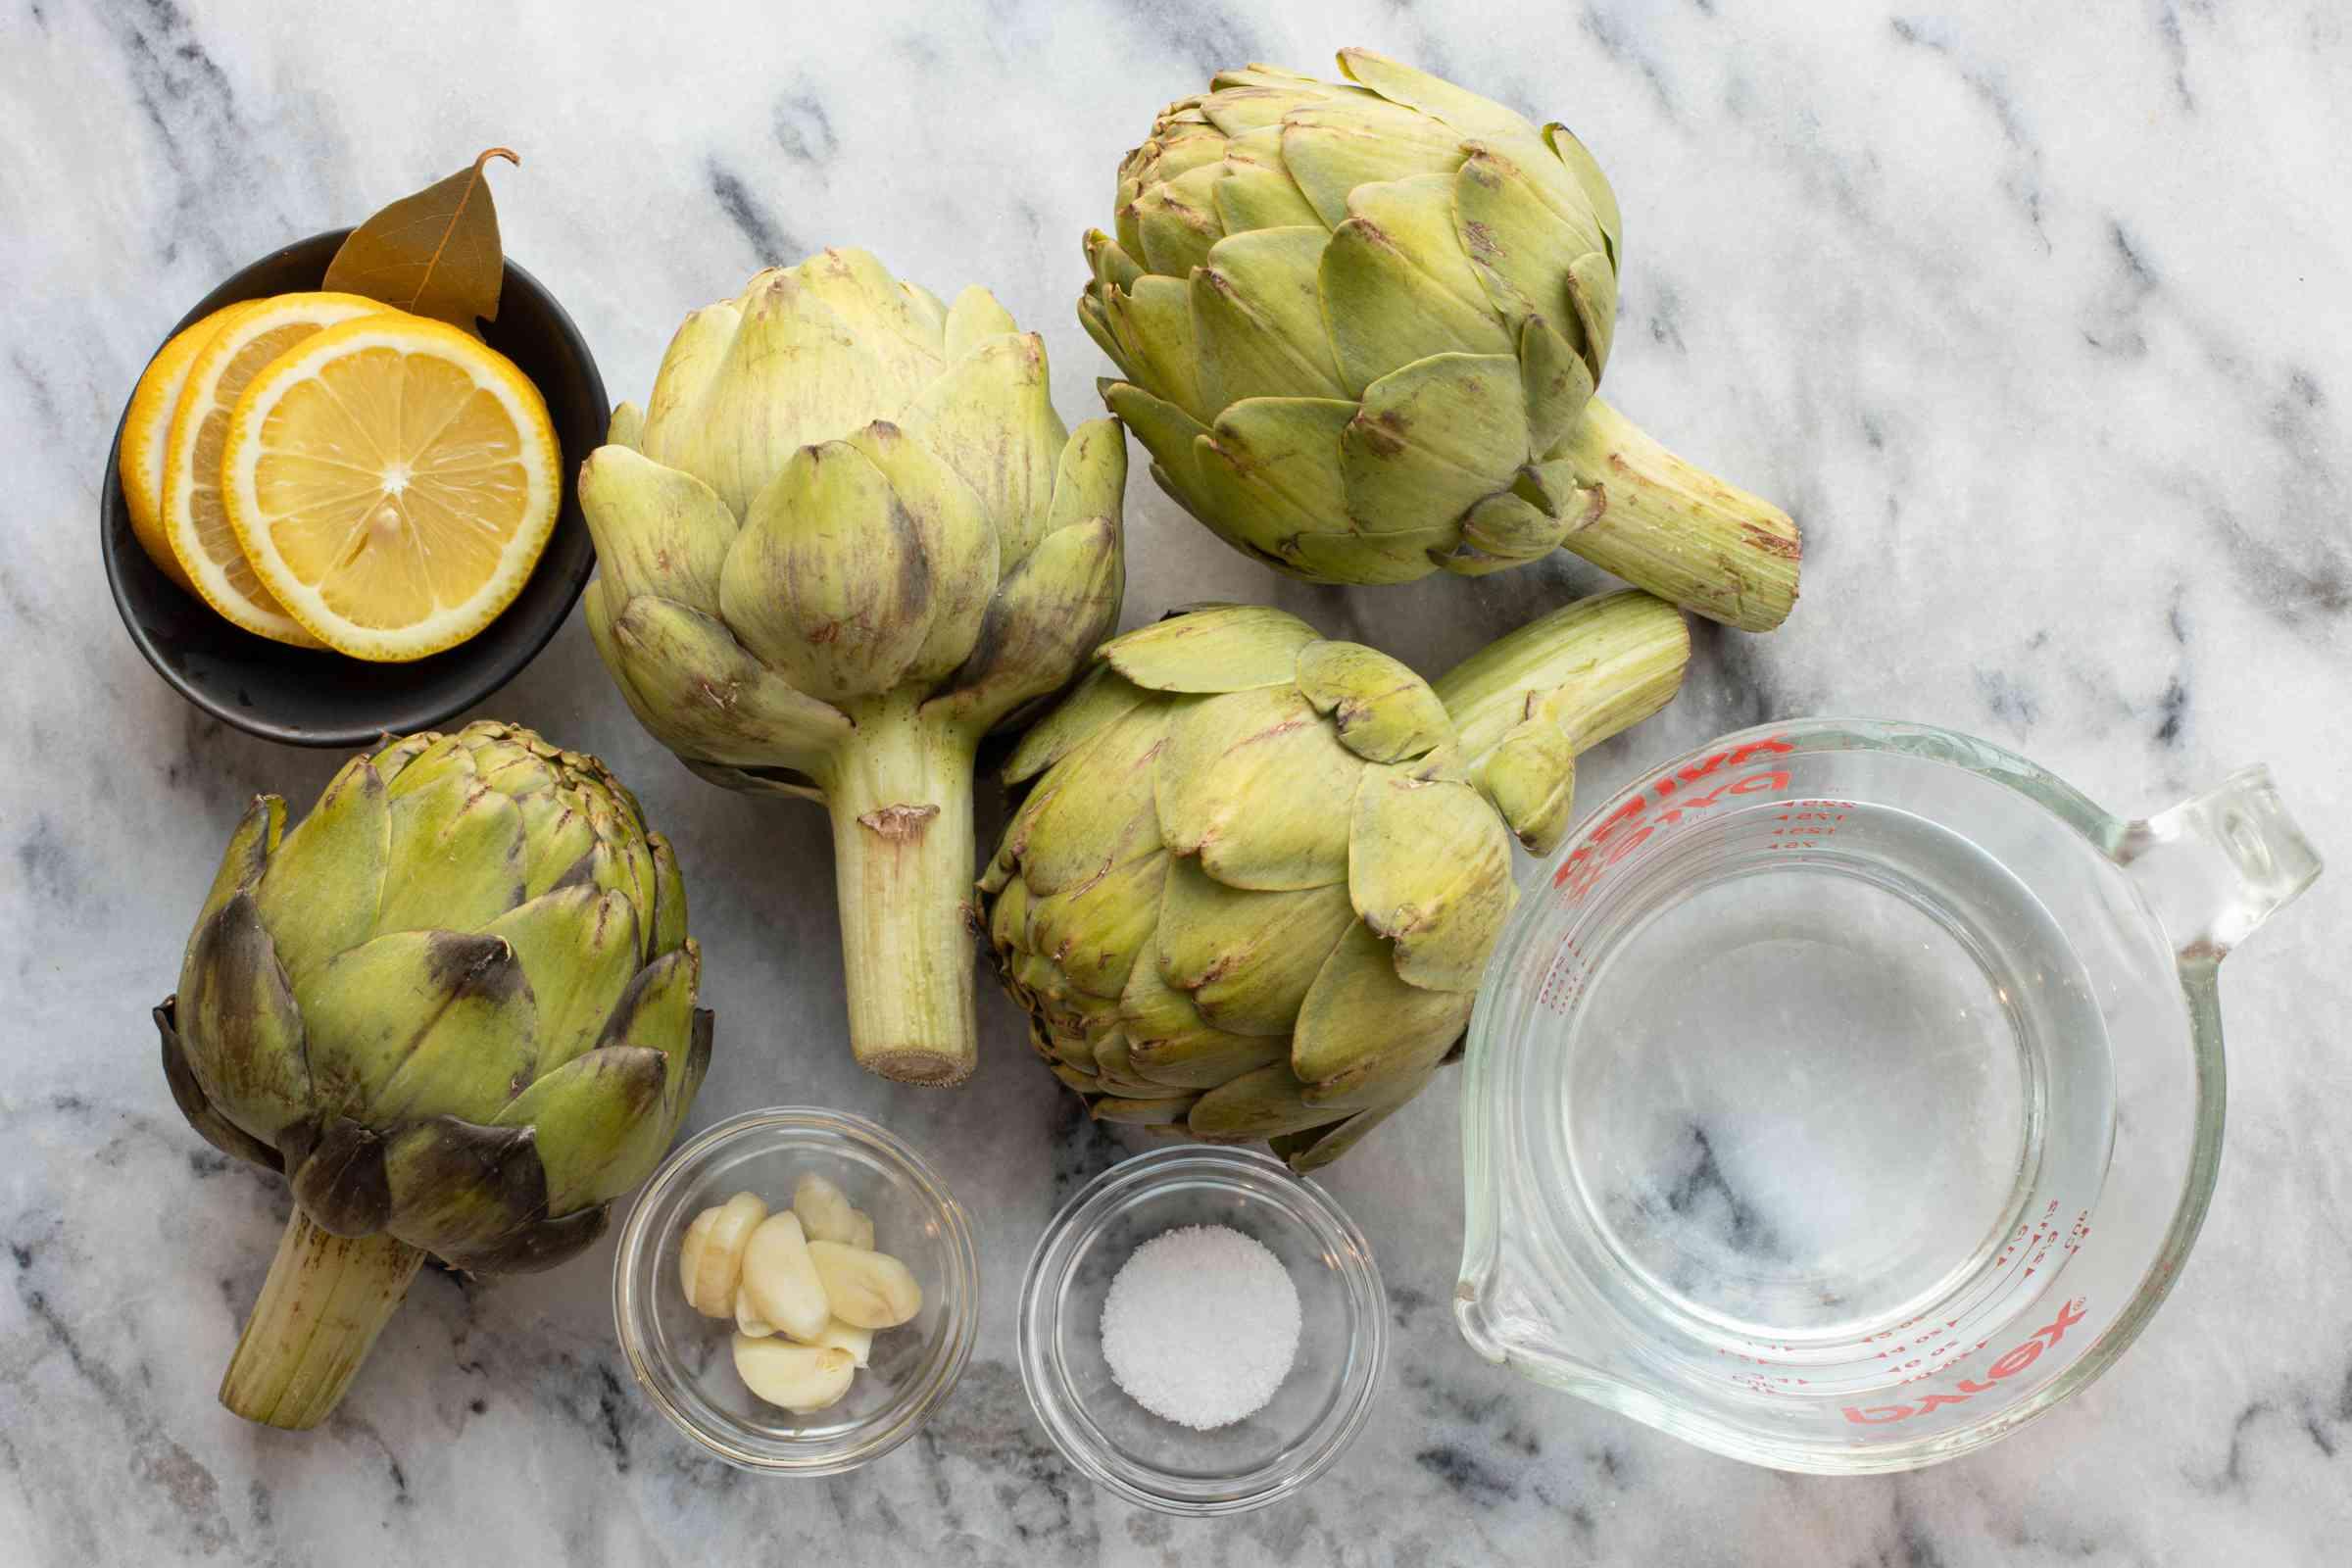 Ingredients for Instant Pot artichokes